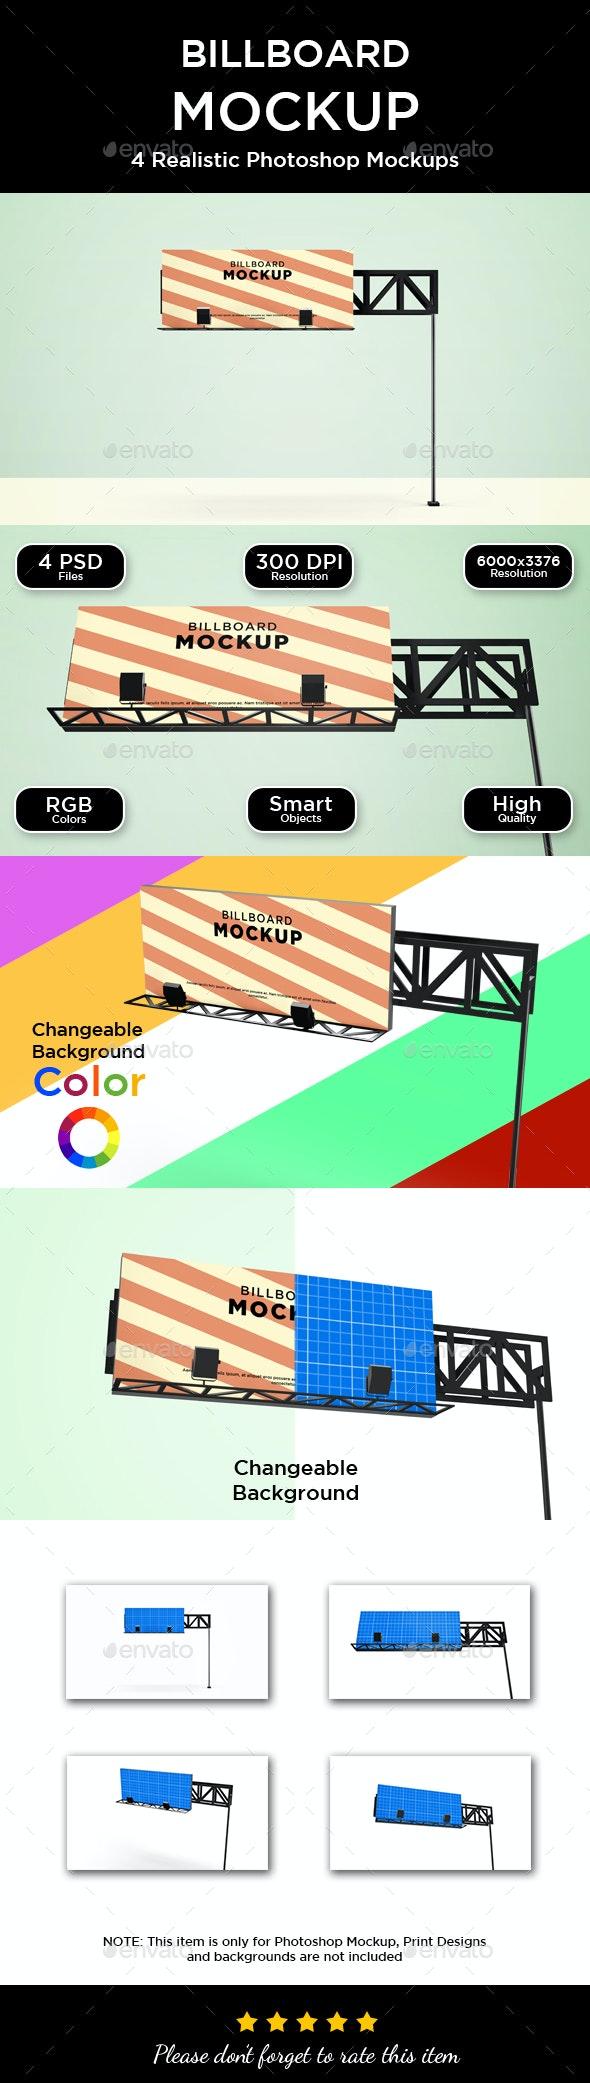 Billboard Mockup - V2 - Print Product Mock-Ups